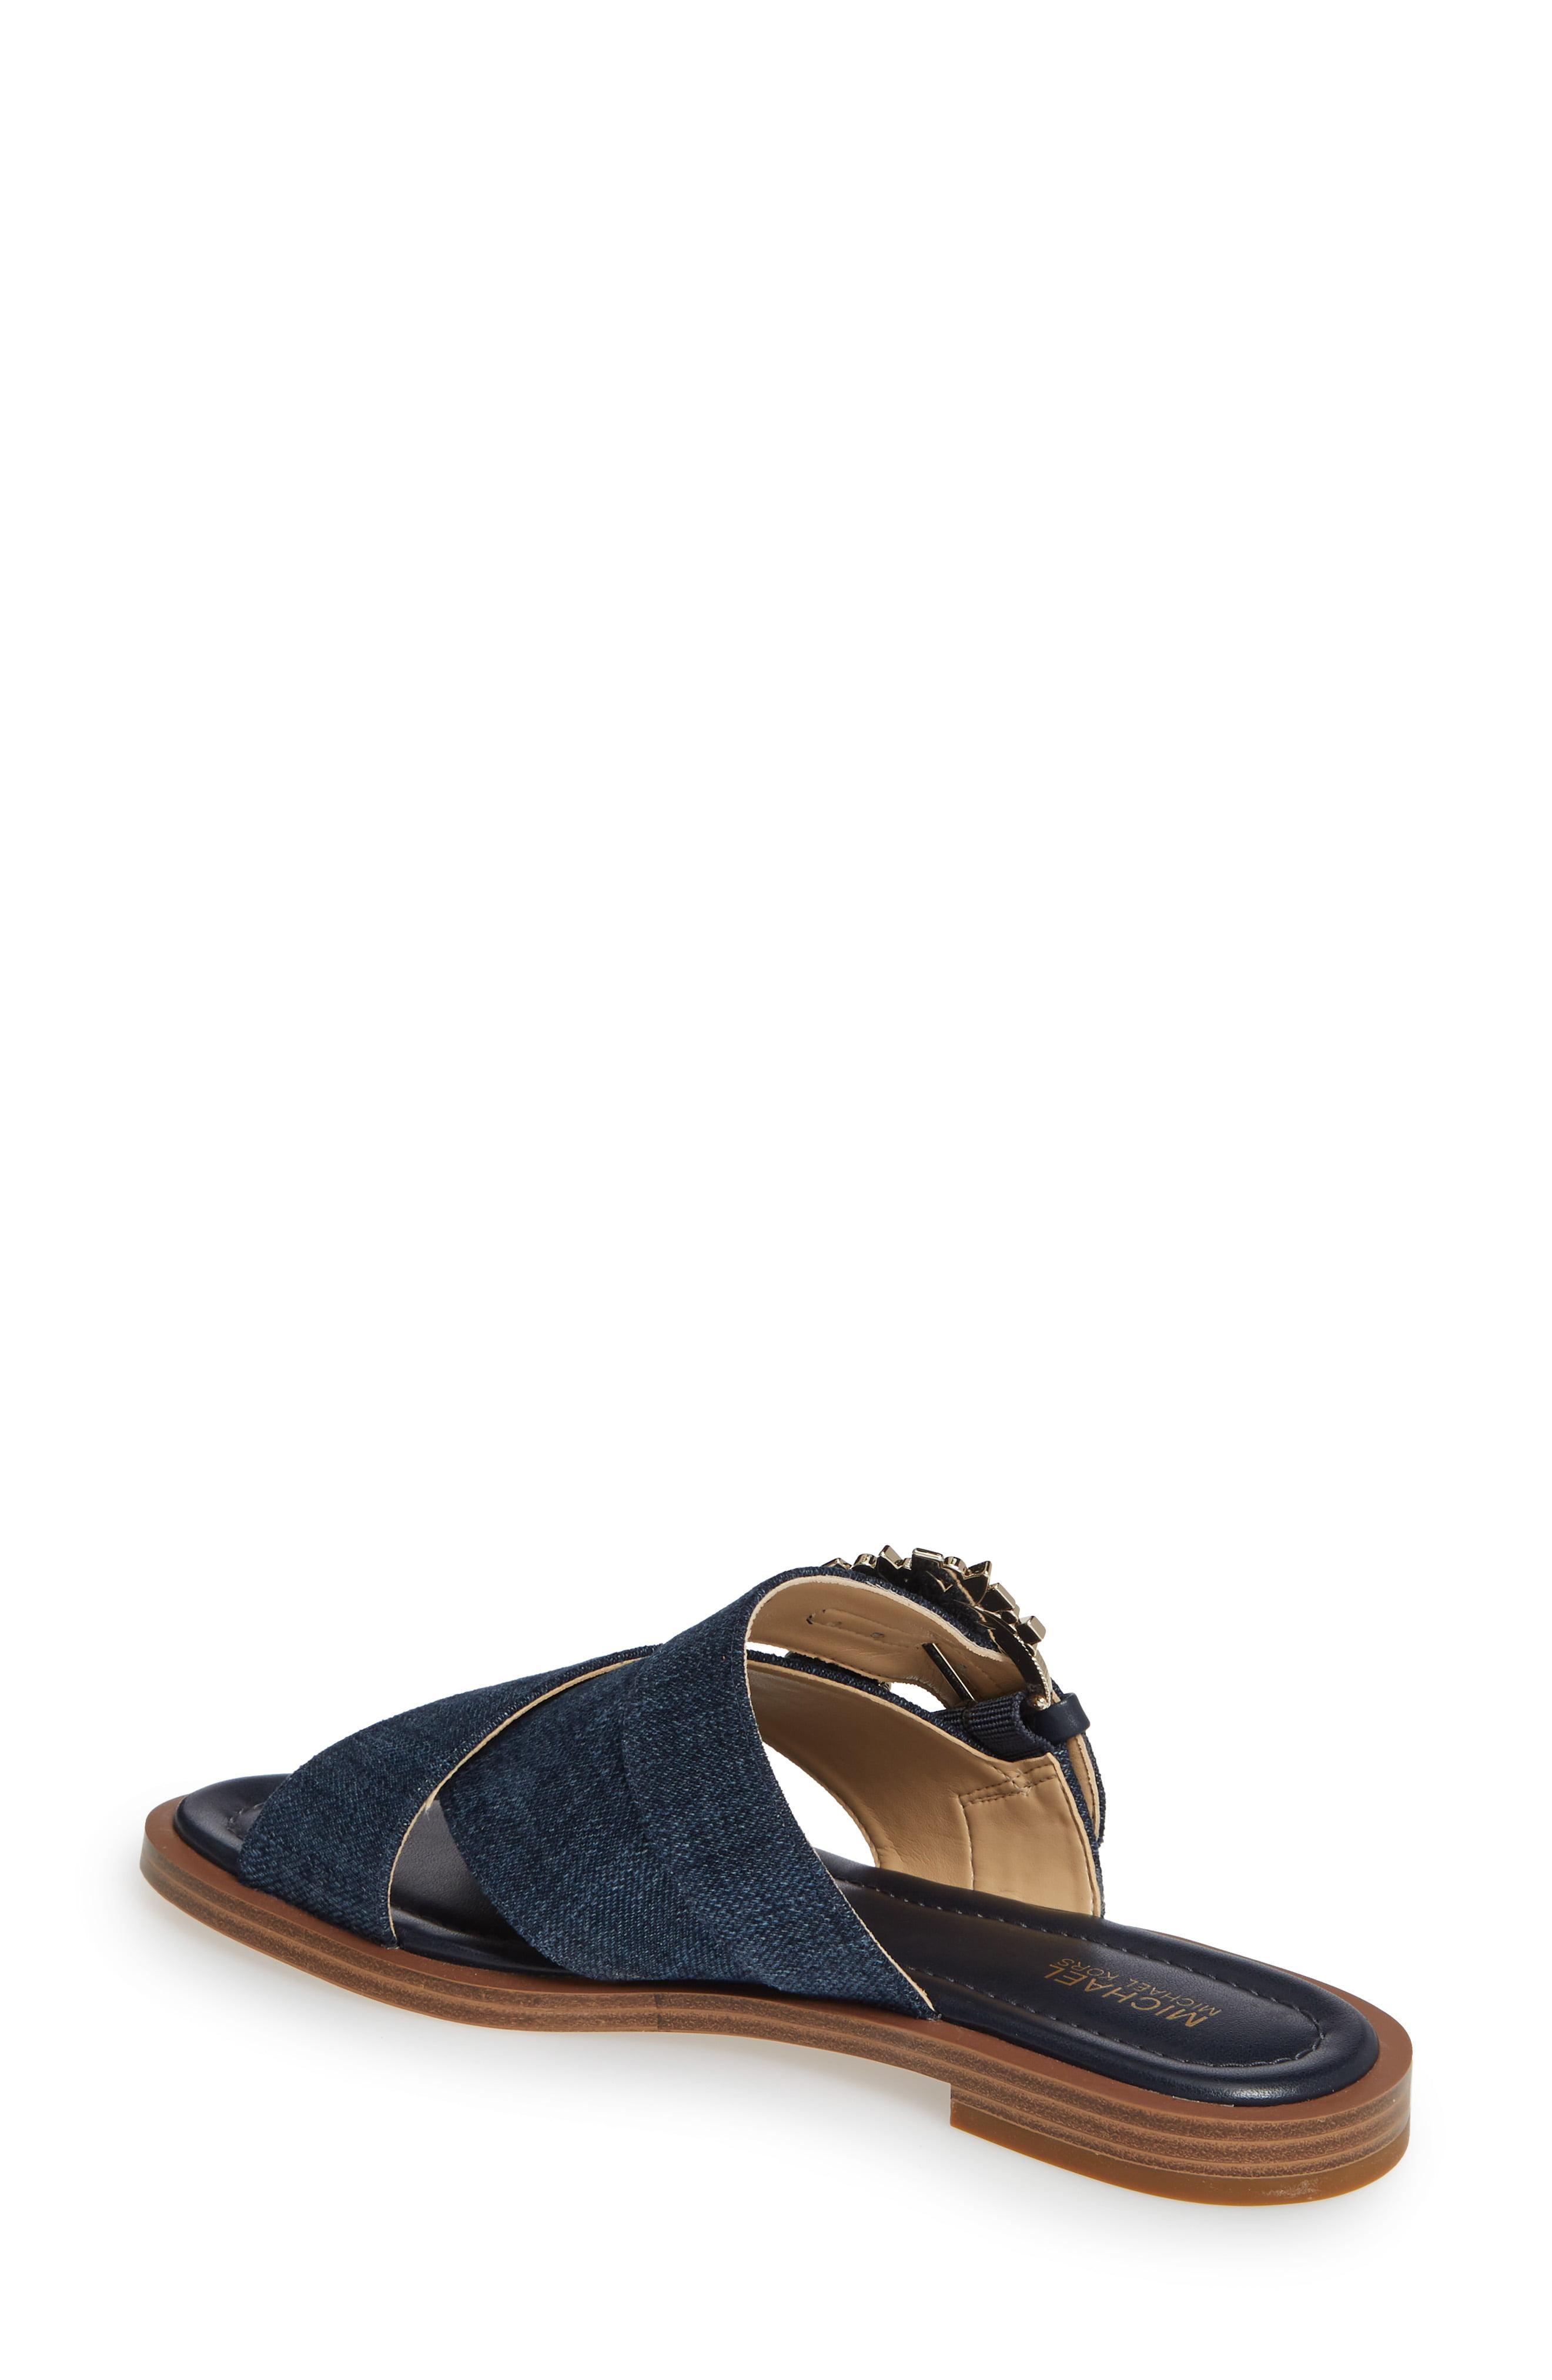 946f9e31a126 MICHAEL Michael Kors - Blue Frieda Slide (indigo Denim) Women s Shoes -  Lyst. View fullscreen